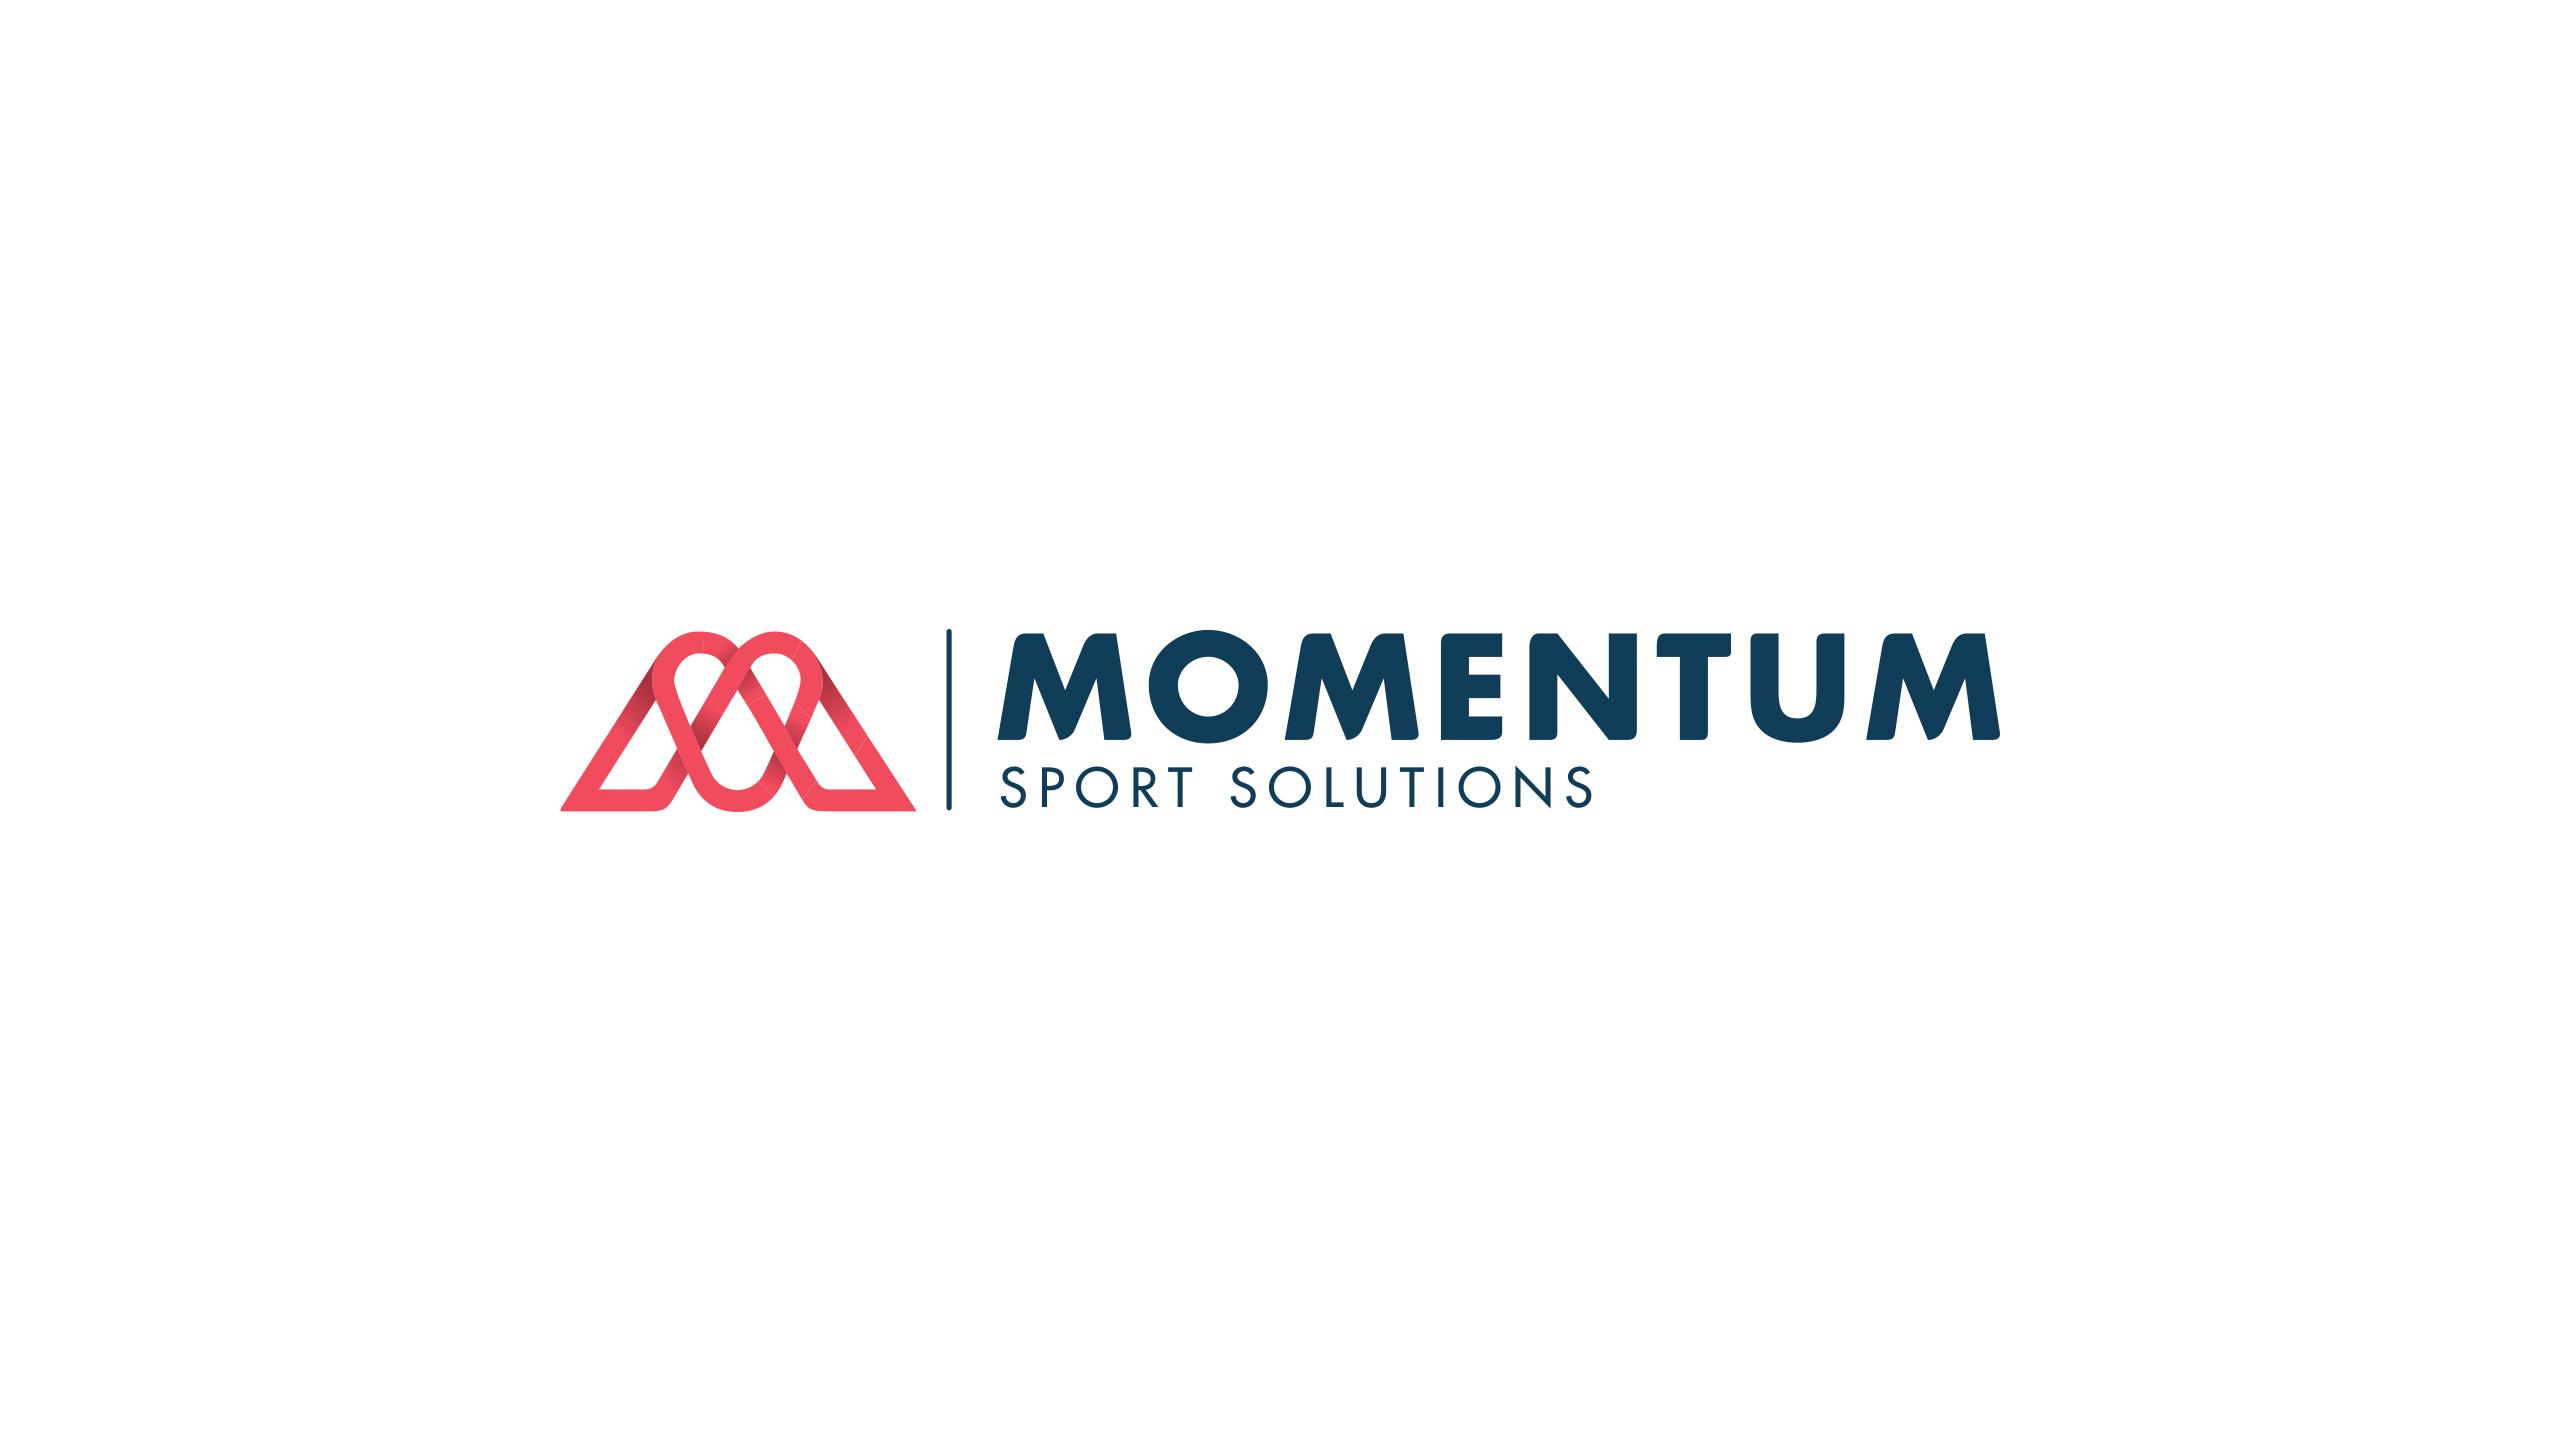 kamikaze_momentum_identidad_07